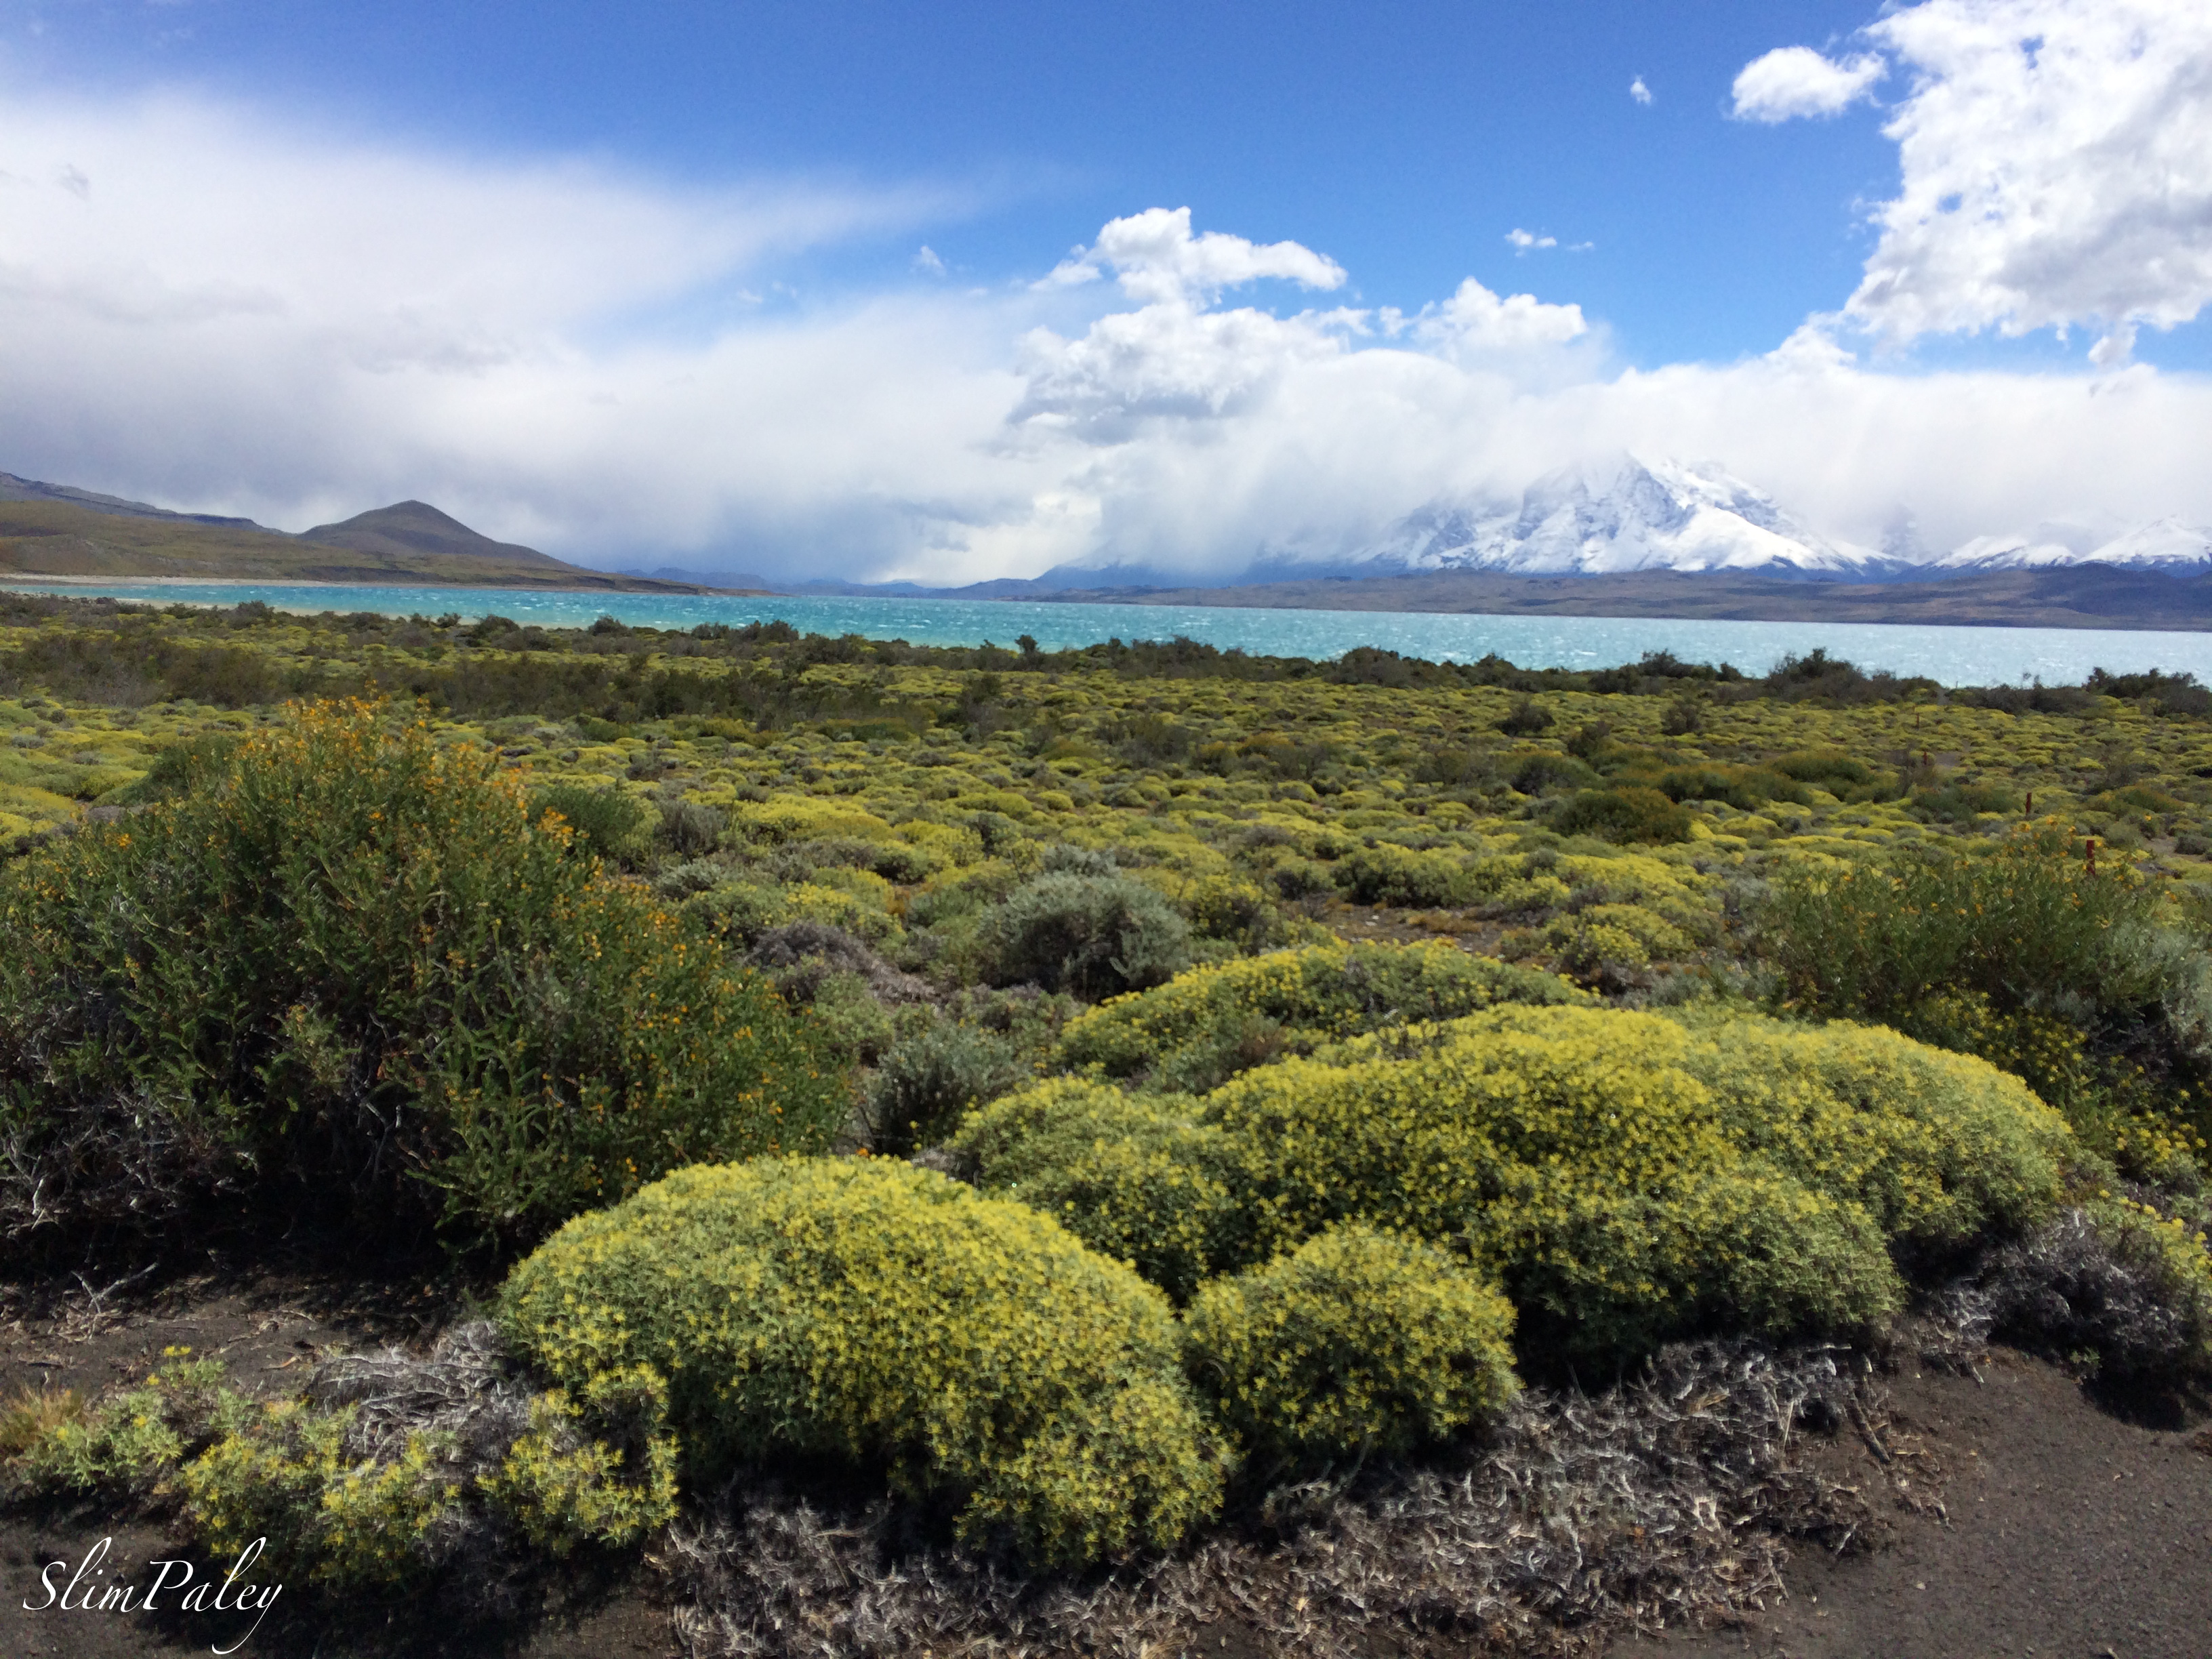 Patagonia , slimpaley.com